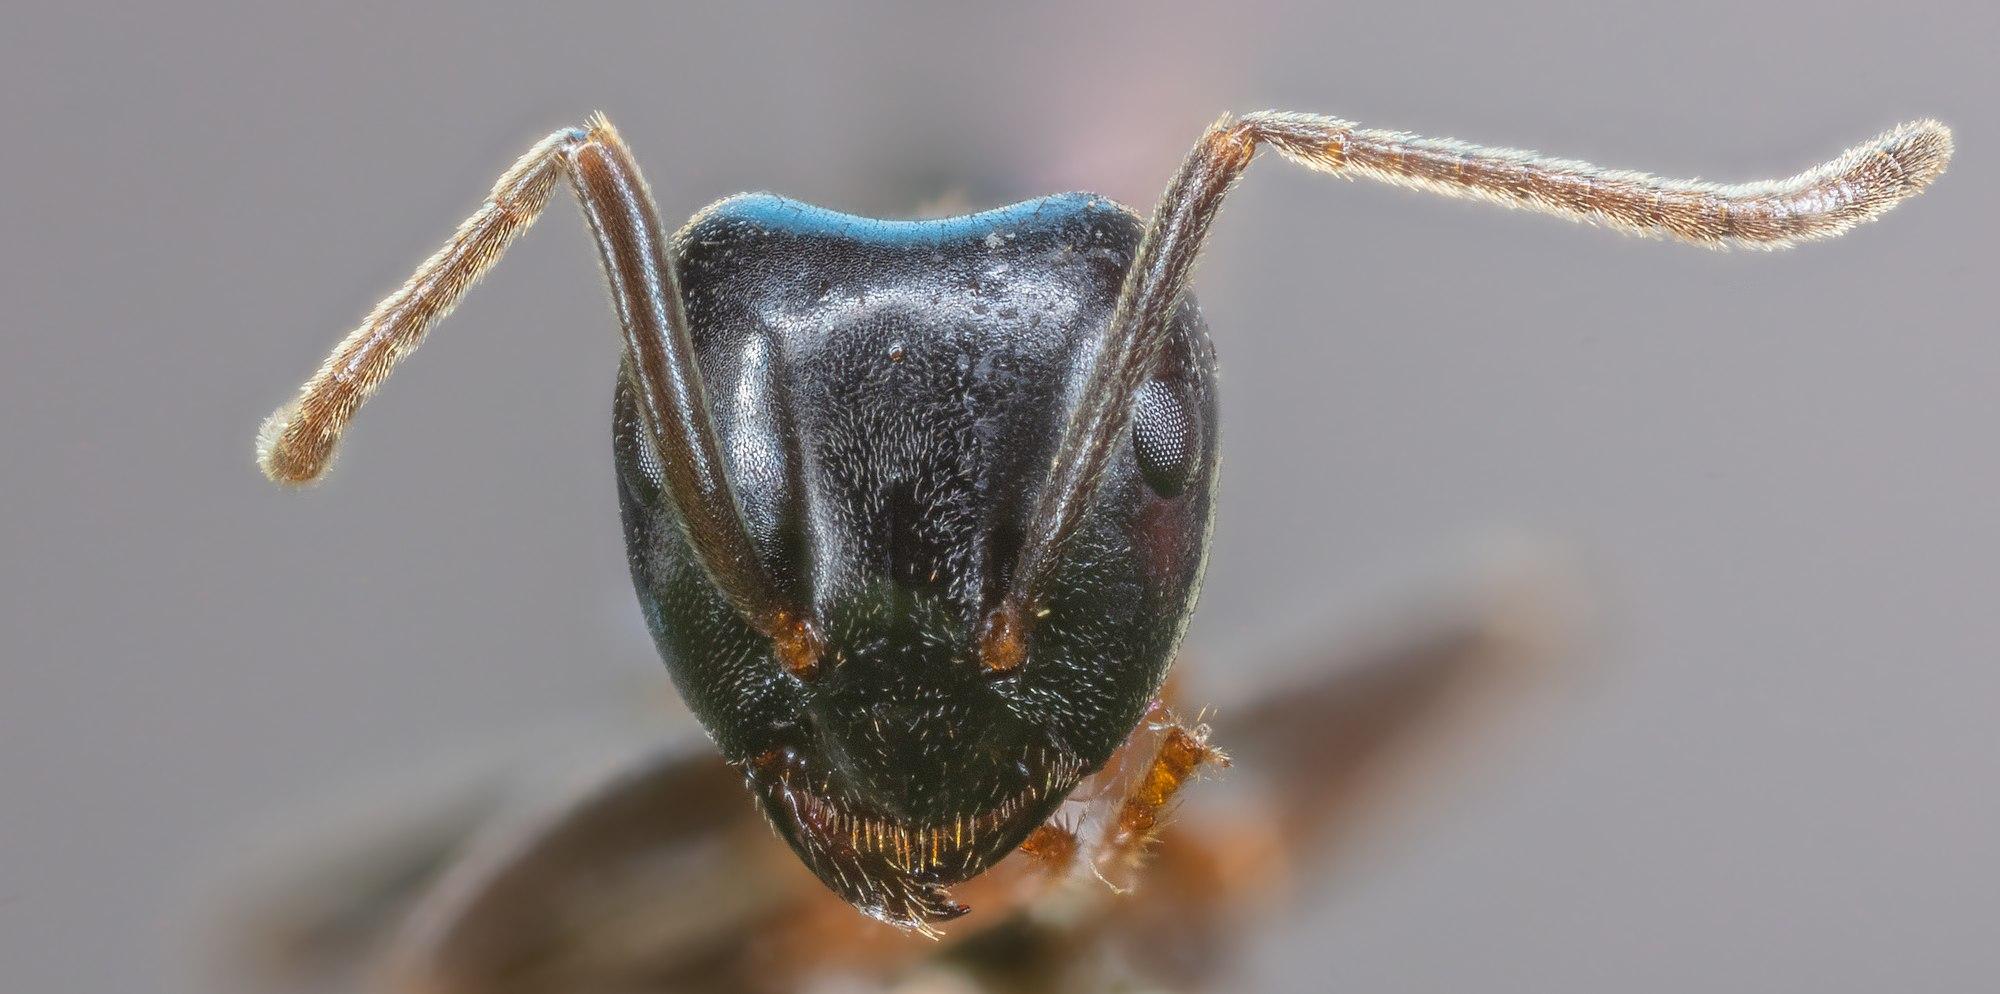 Pharaoh ant (Monomorium pharaonis), Hartelholz, Munich, Germany